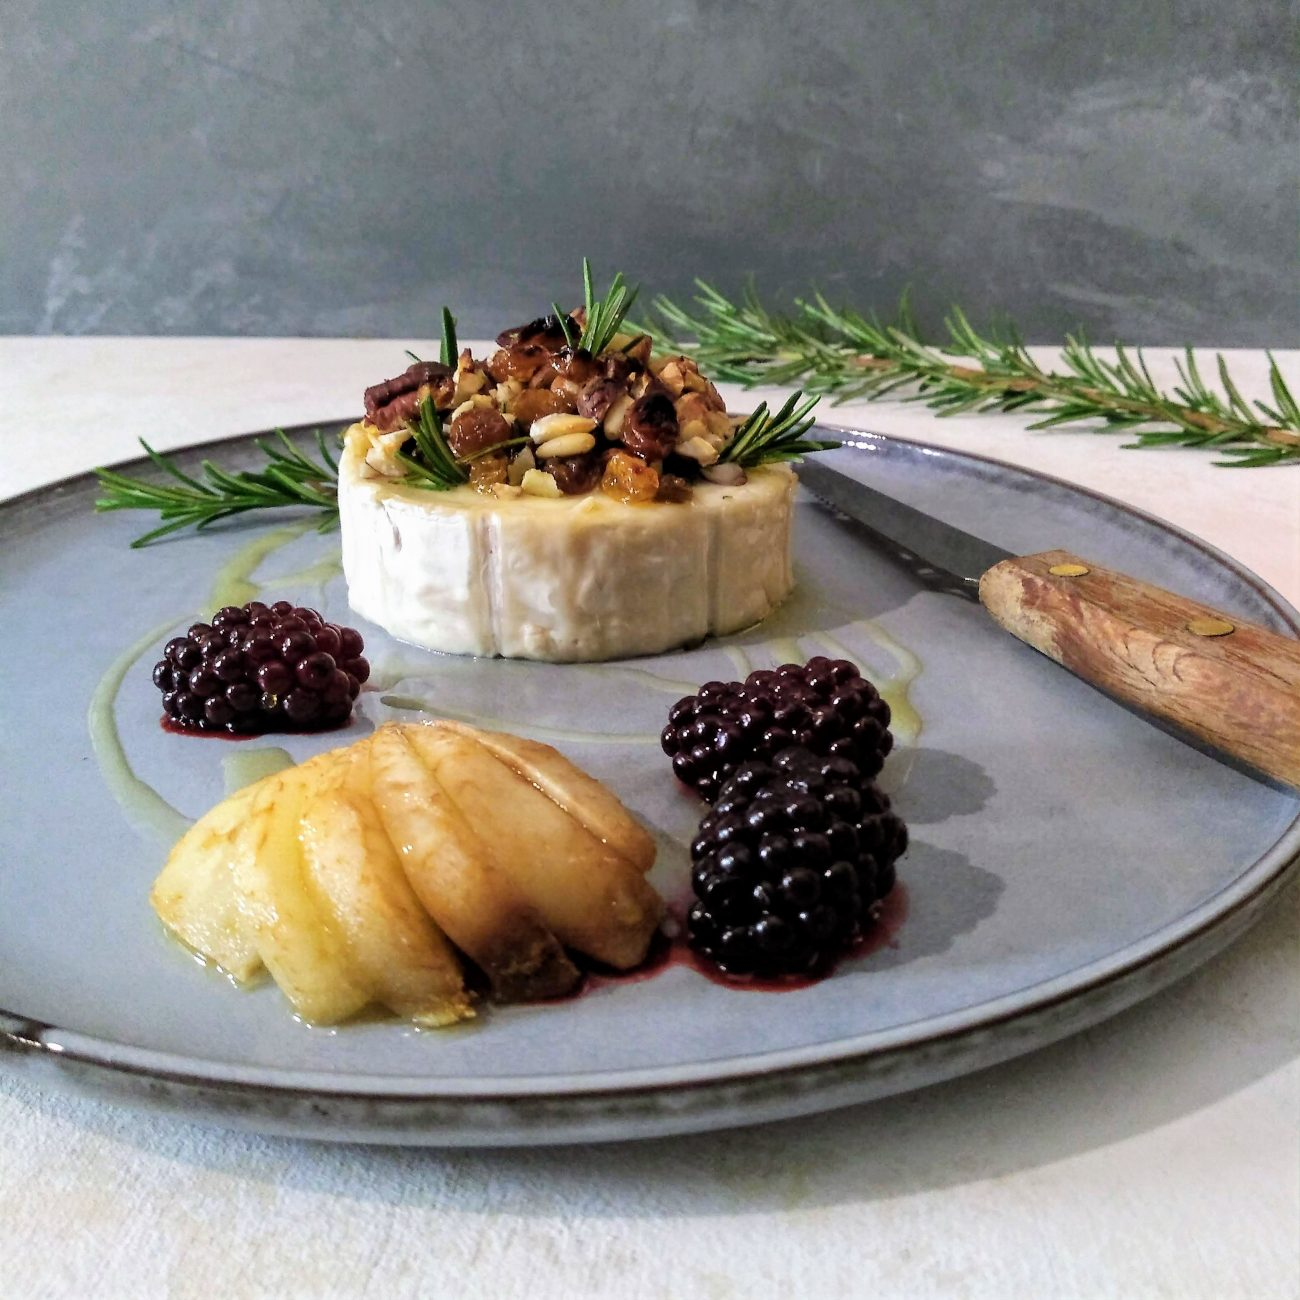 Warme geitenkaas met noten, honing, peer en bramen